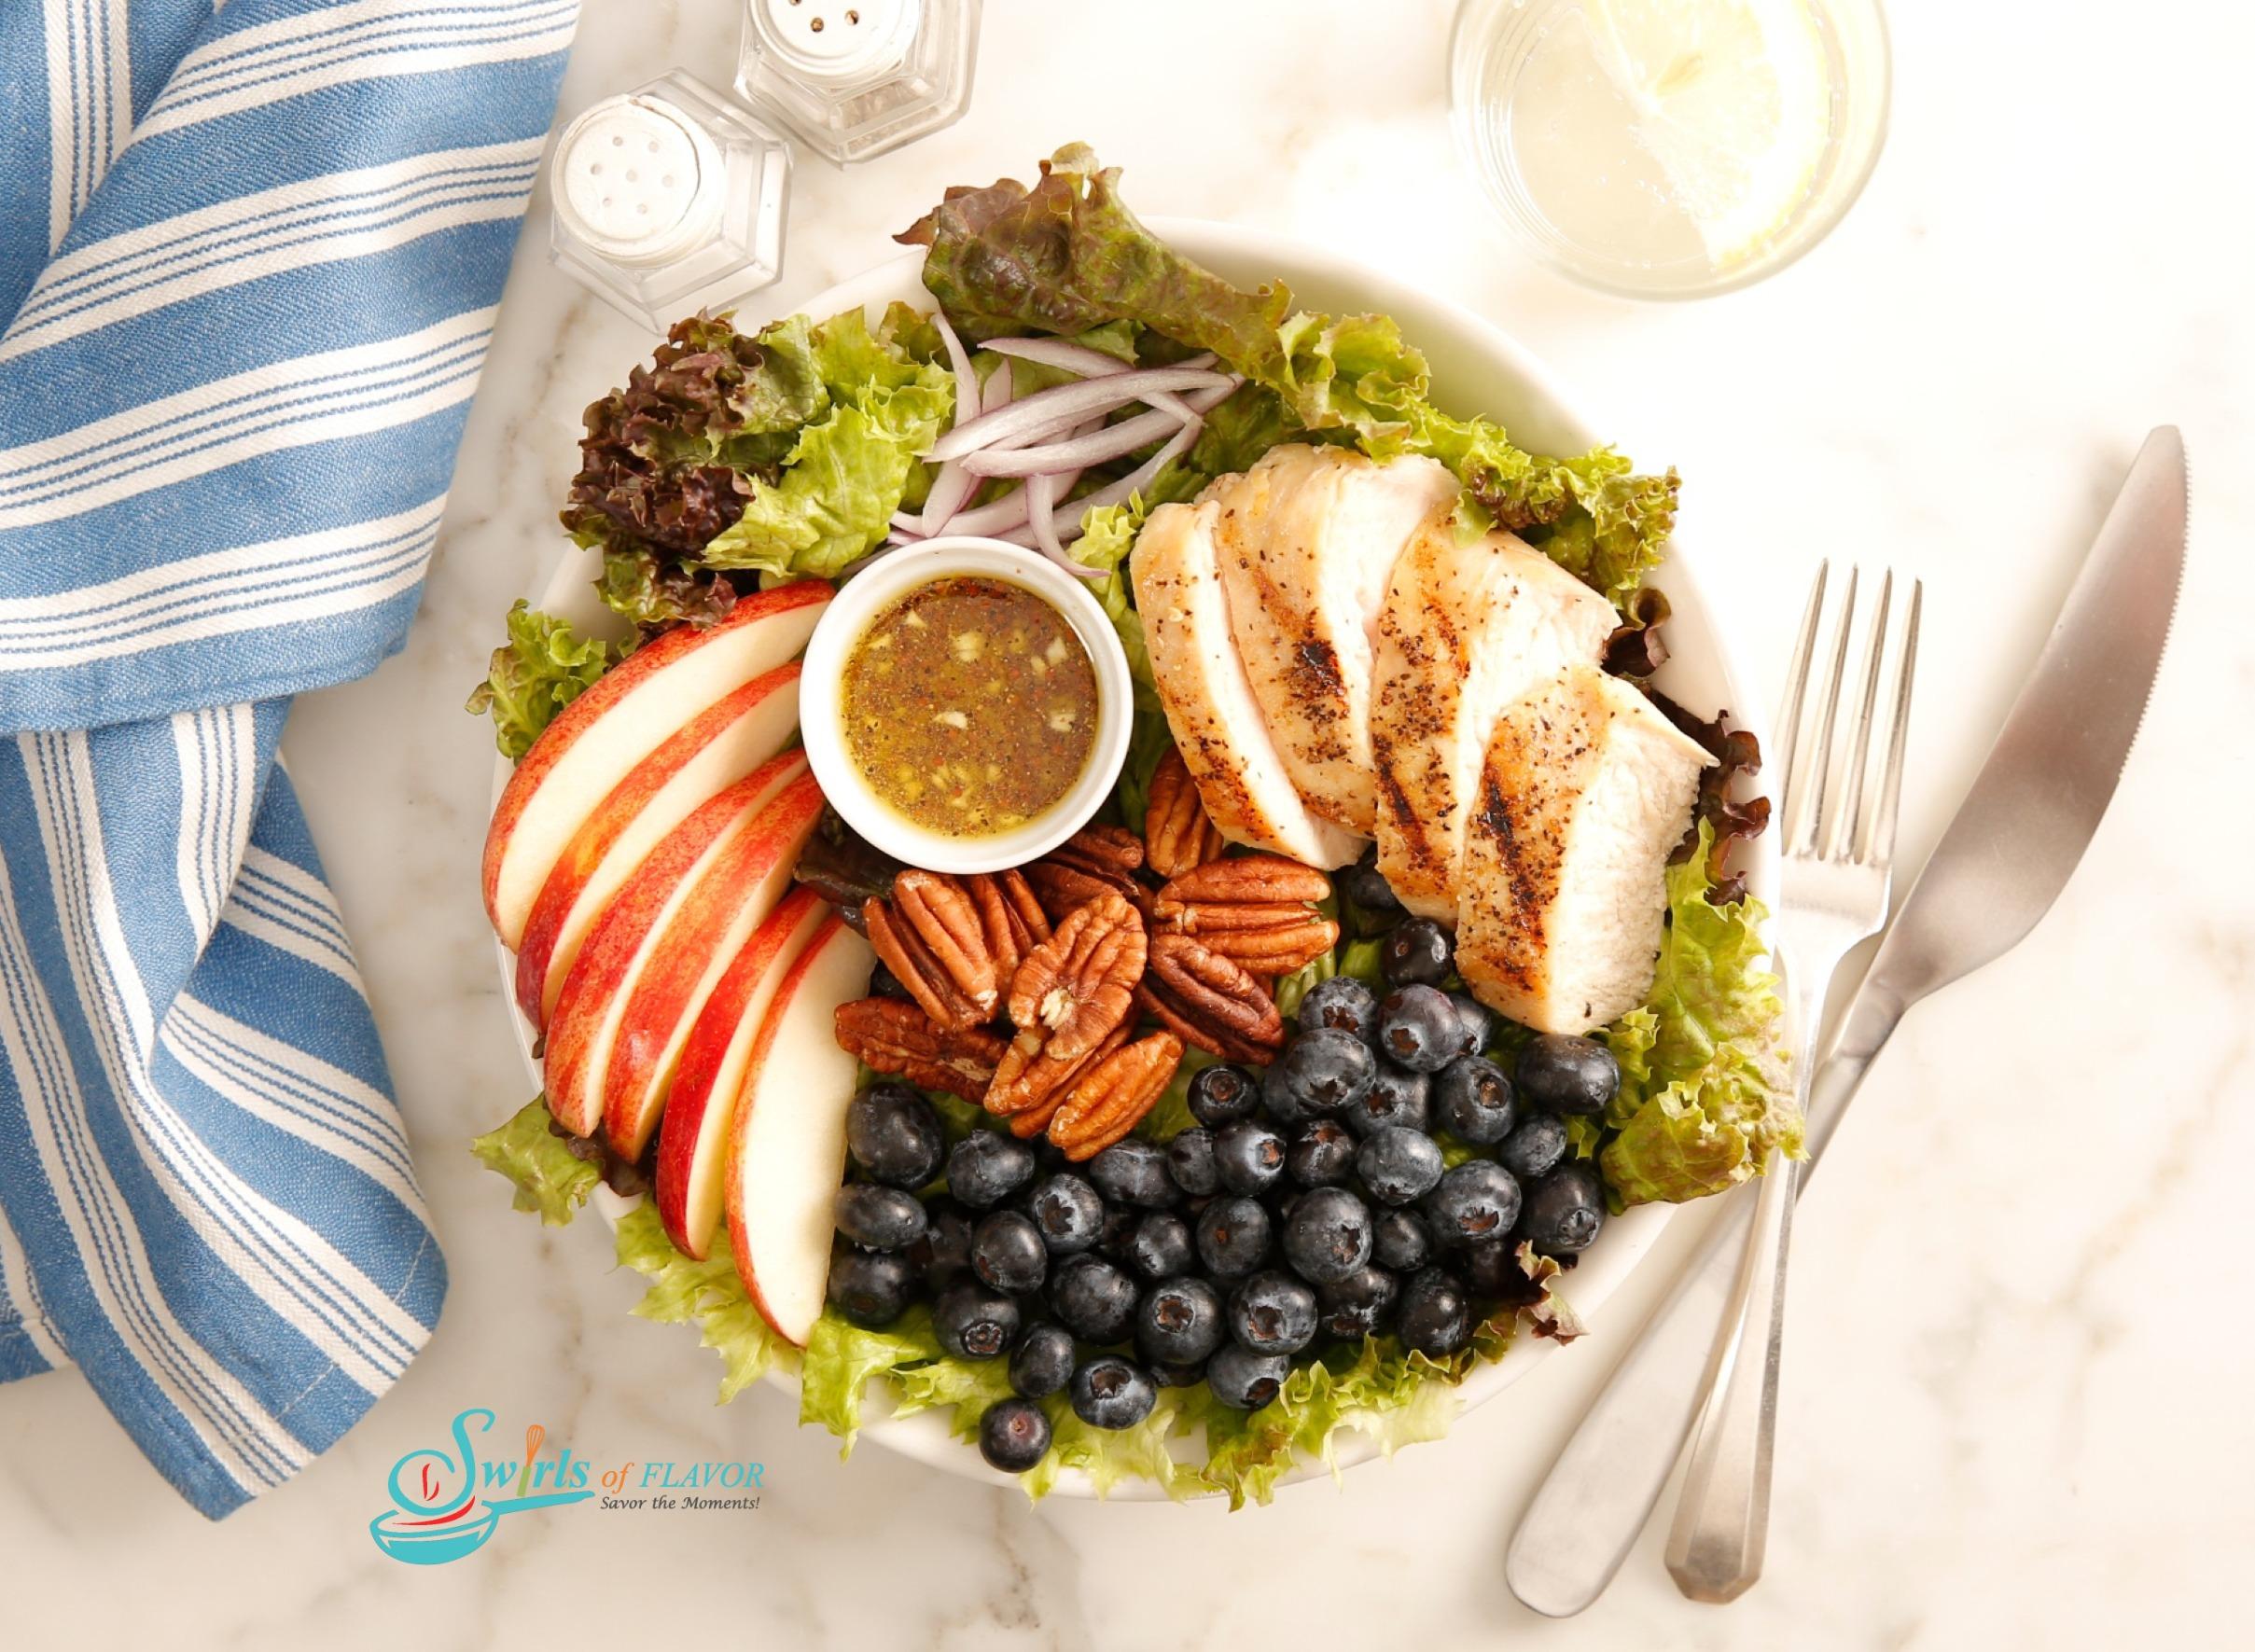 Arranged salad of chicken, blueberries, apples and honey mustard salad dressing